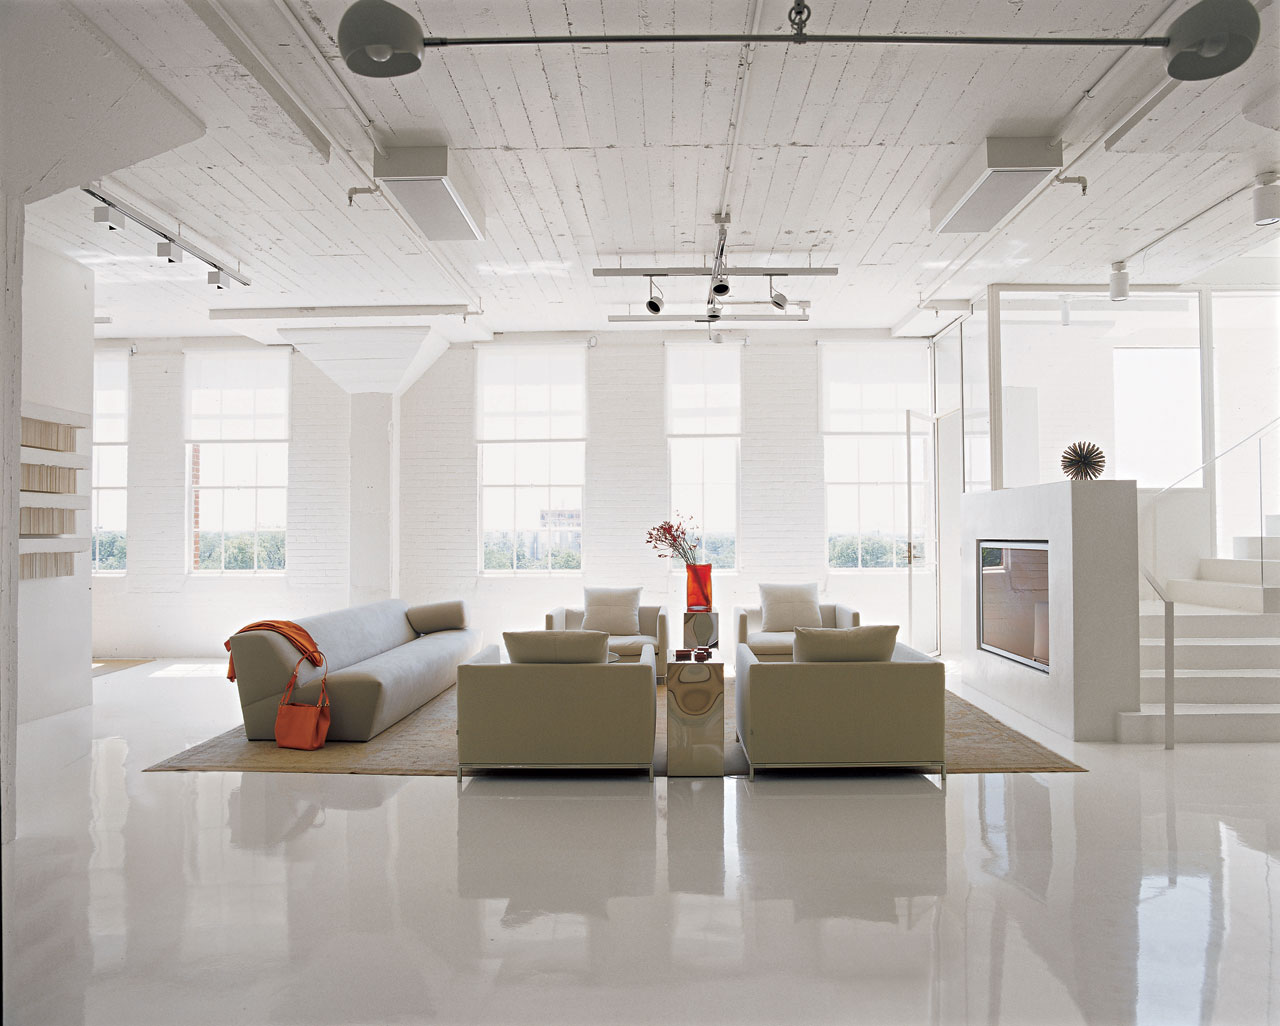 Moderne boden fur wohnzimmer 4163761 - sixpacknow.info